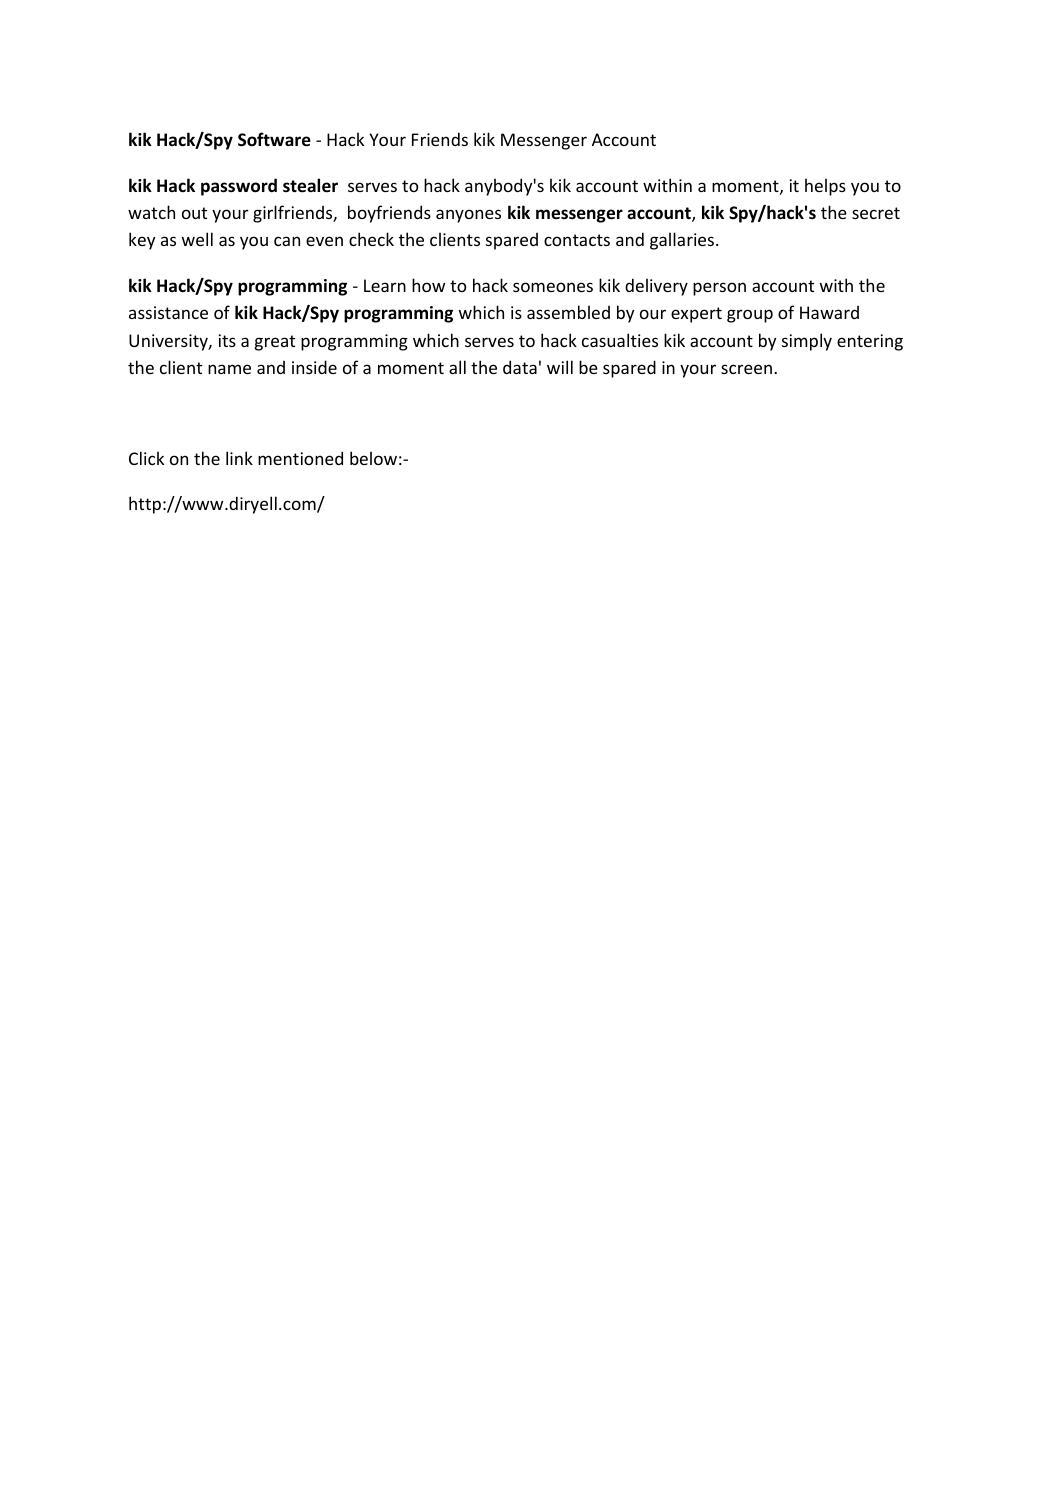 Kik hack software by kikhacksoftware - issuu